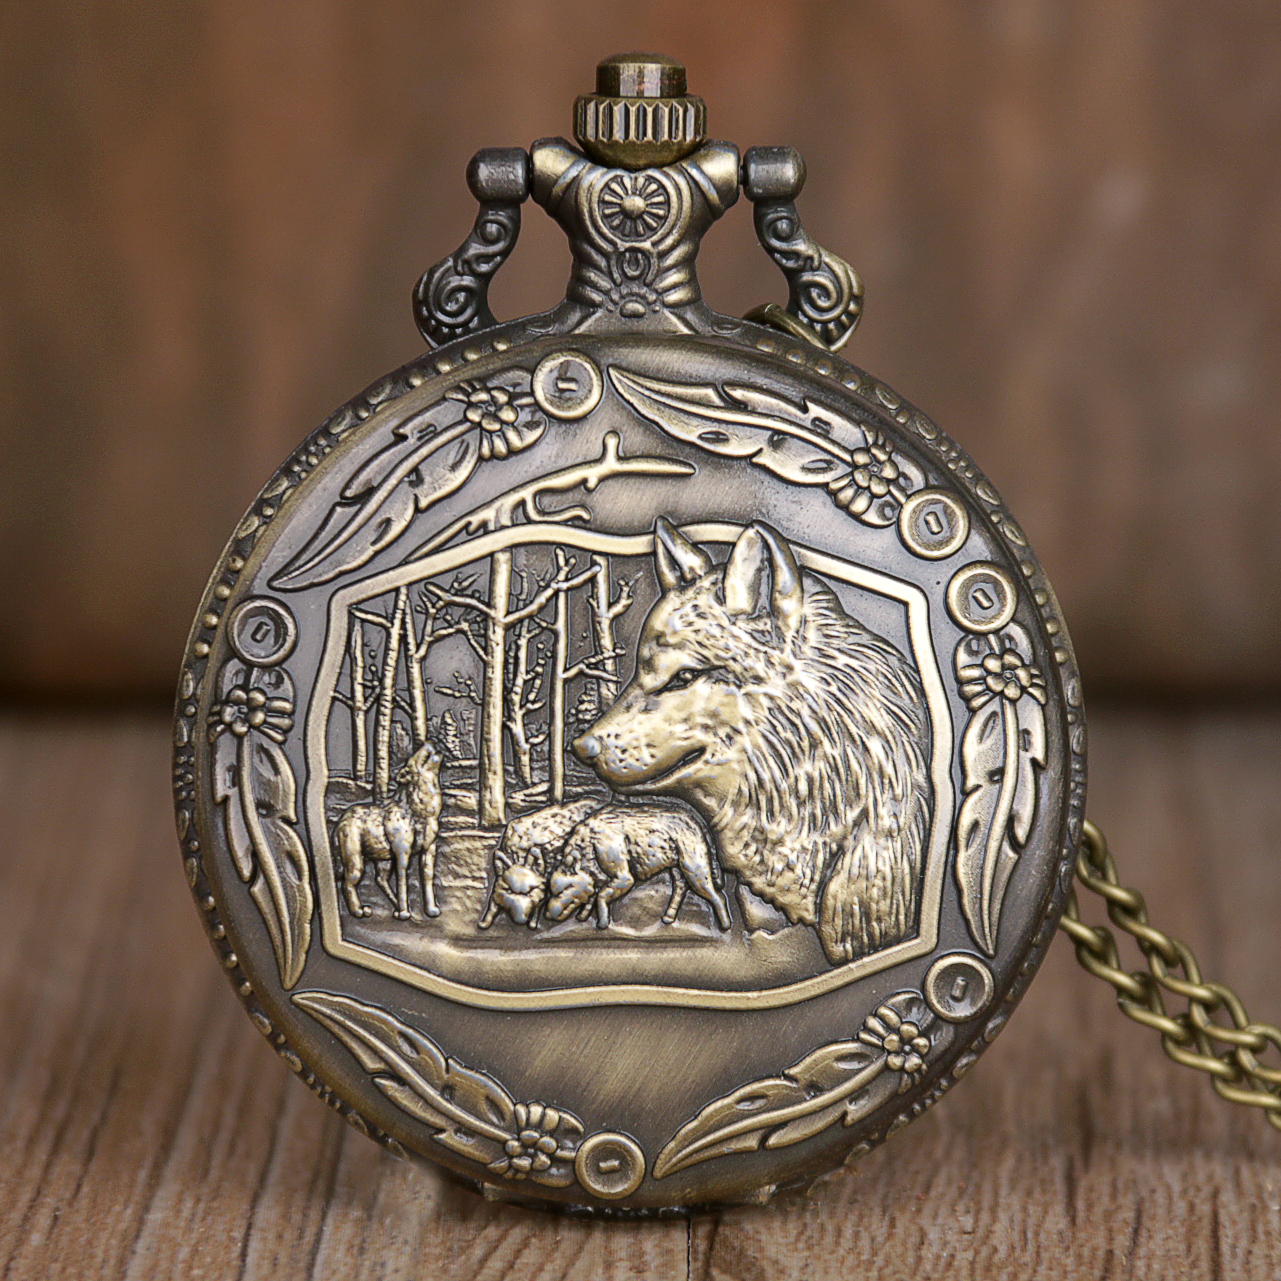 Vintage Bronze Wolf Game of Thrones Quartz Pocket Watch Men Women Pendant Necklace Jewelry Gifts TD2070